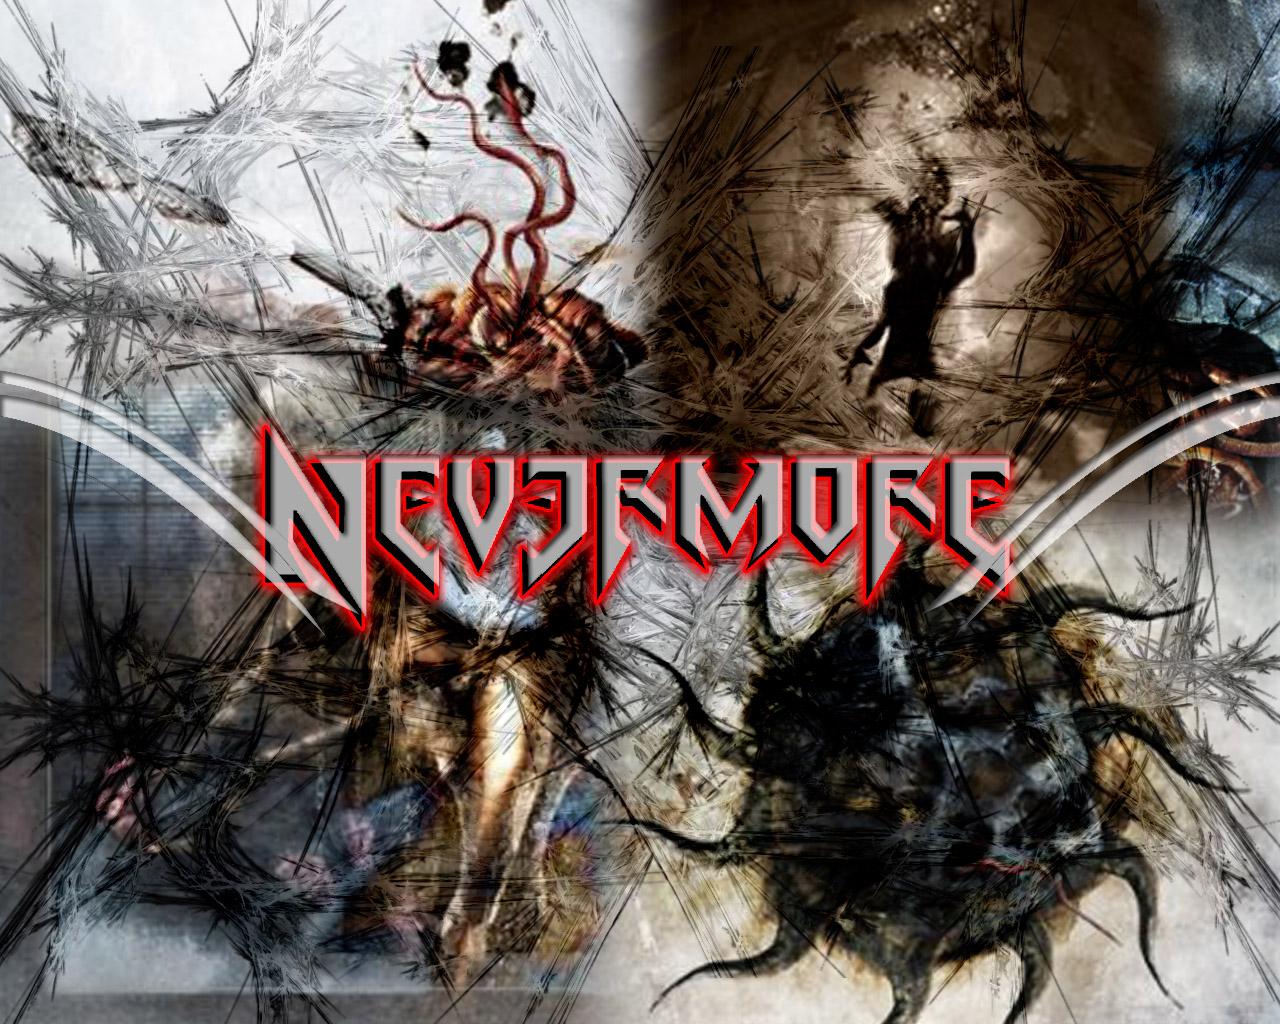 Nevermore Desktop Backgrounds 1280x1024